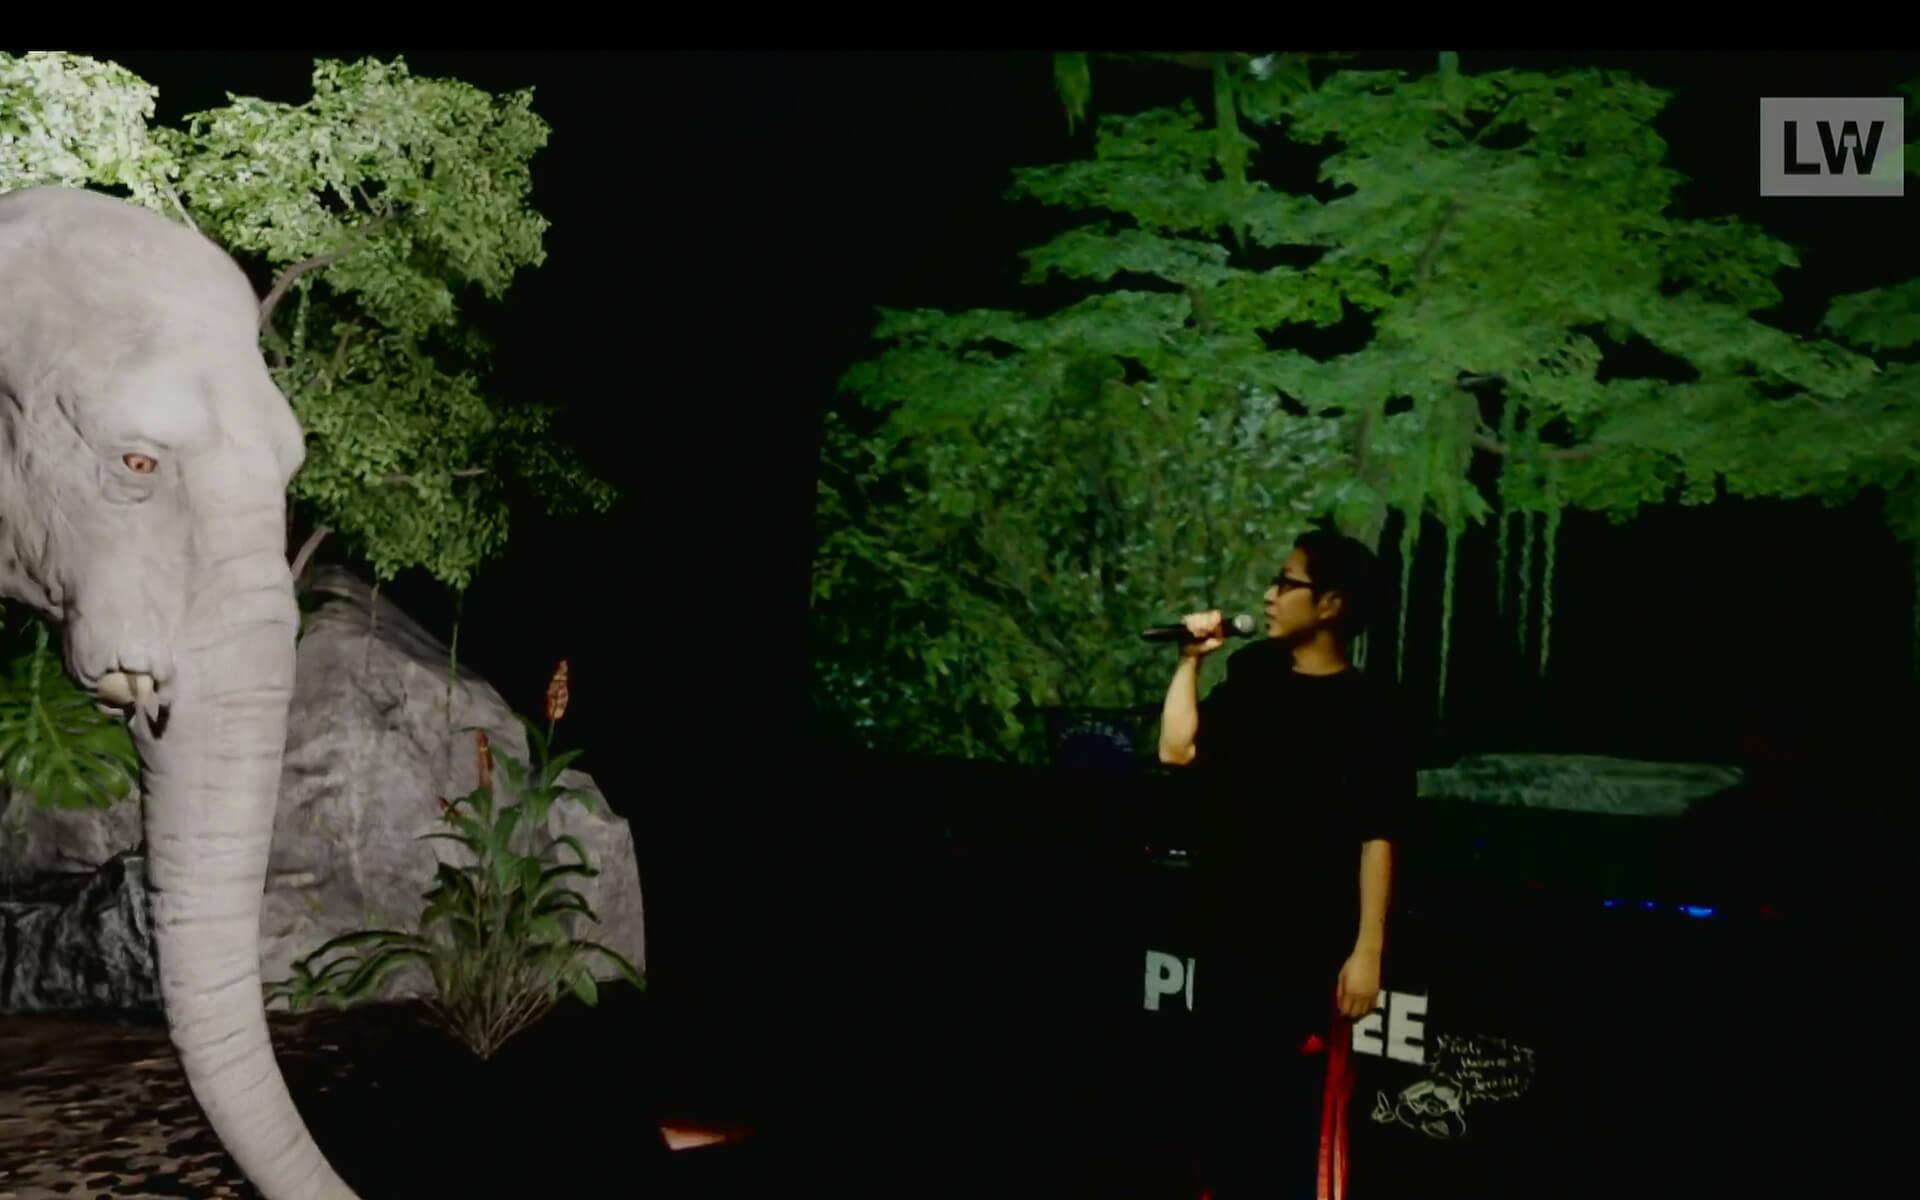 LIVEWIRE PUNPEE<Sofa Kingdomcome>のイースターエッグを一挙紹介! by みやーんZZ music200918_punpee_livewire_11